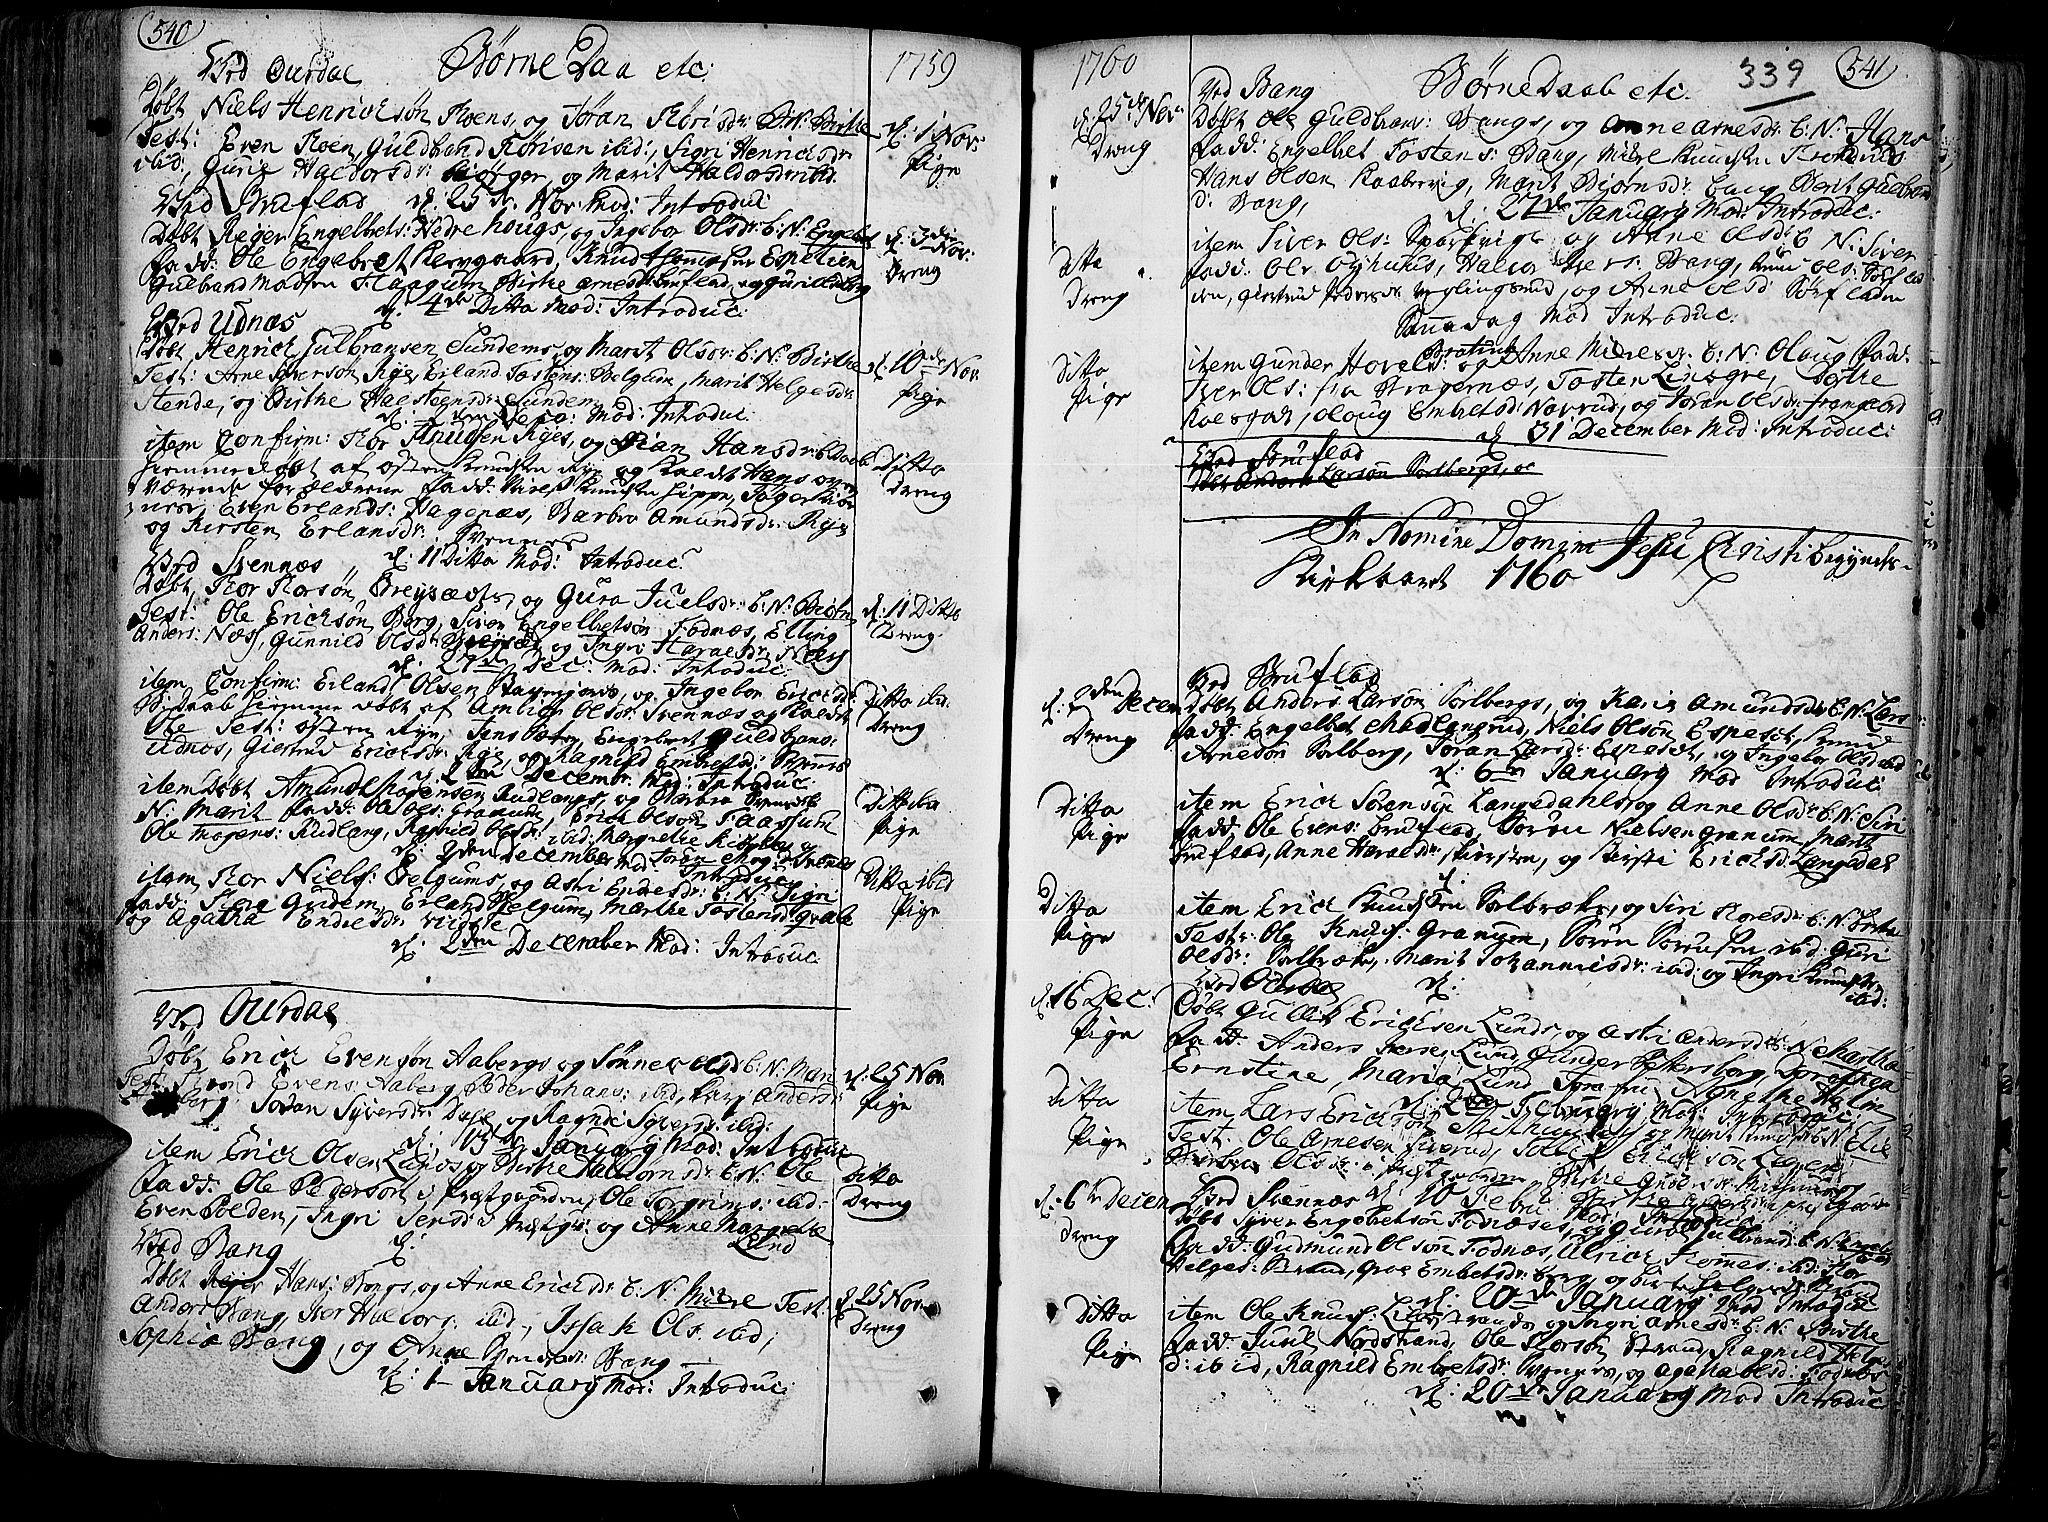 SAH, Aurdal prestekontor, Ministerialbok nr. 4, 1730-1762, s. 540-541